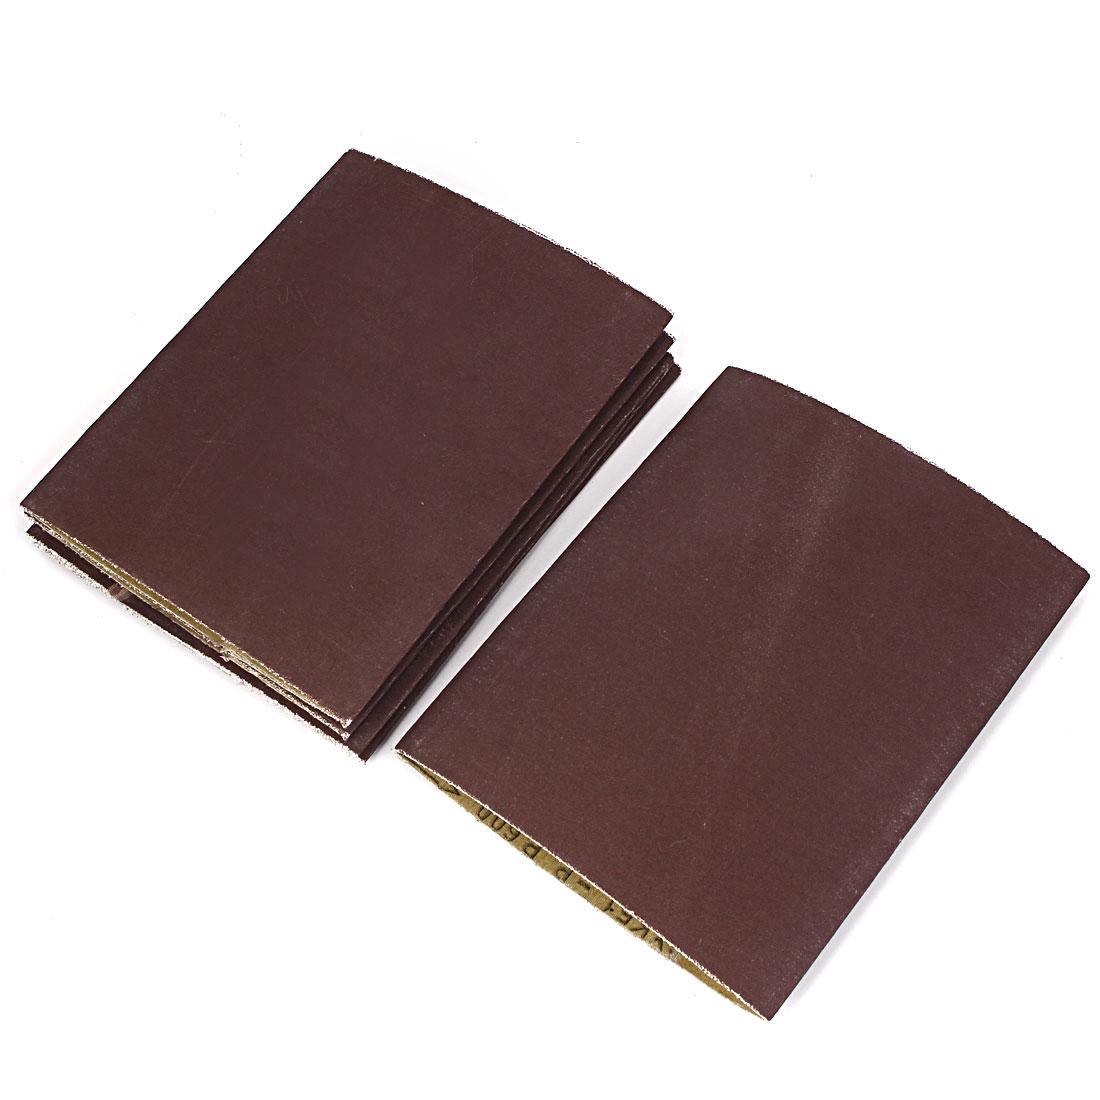 Woodworking 340mmx210mm 600 Grit Abrasive Sanding Belt Sandpaper 6pcs